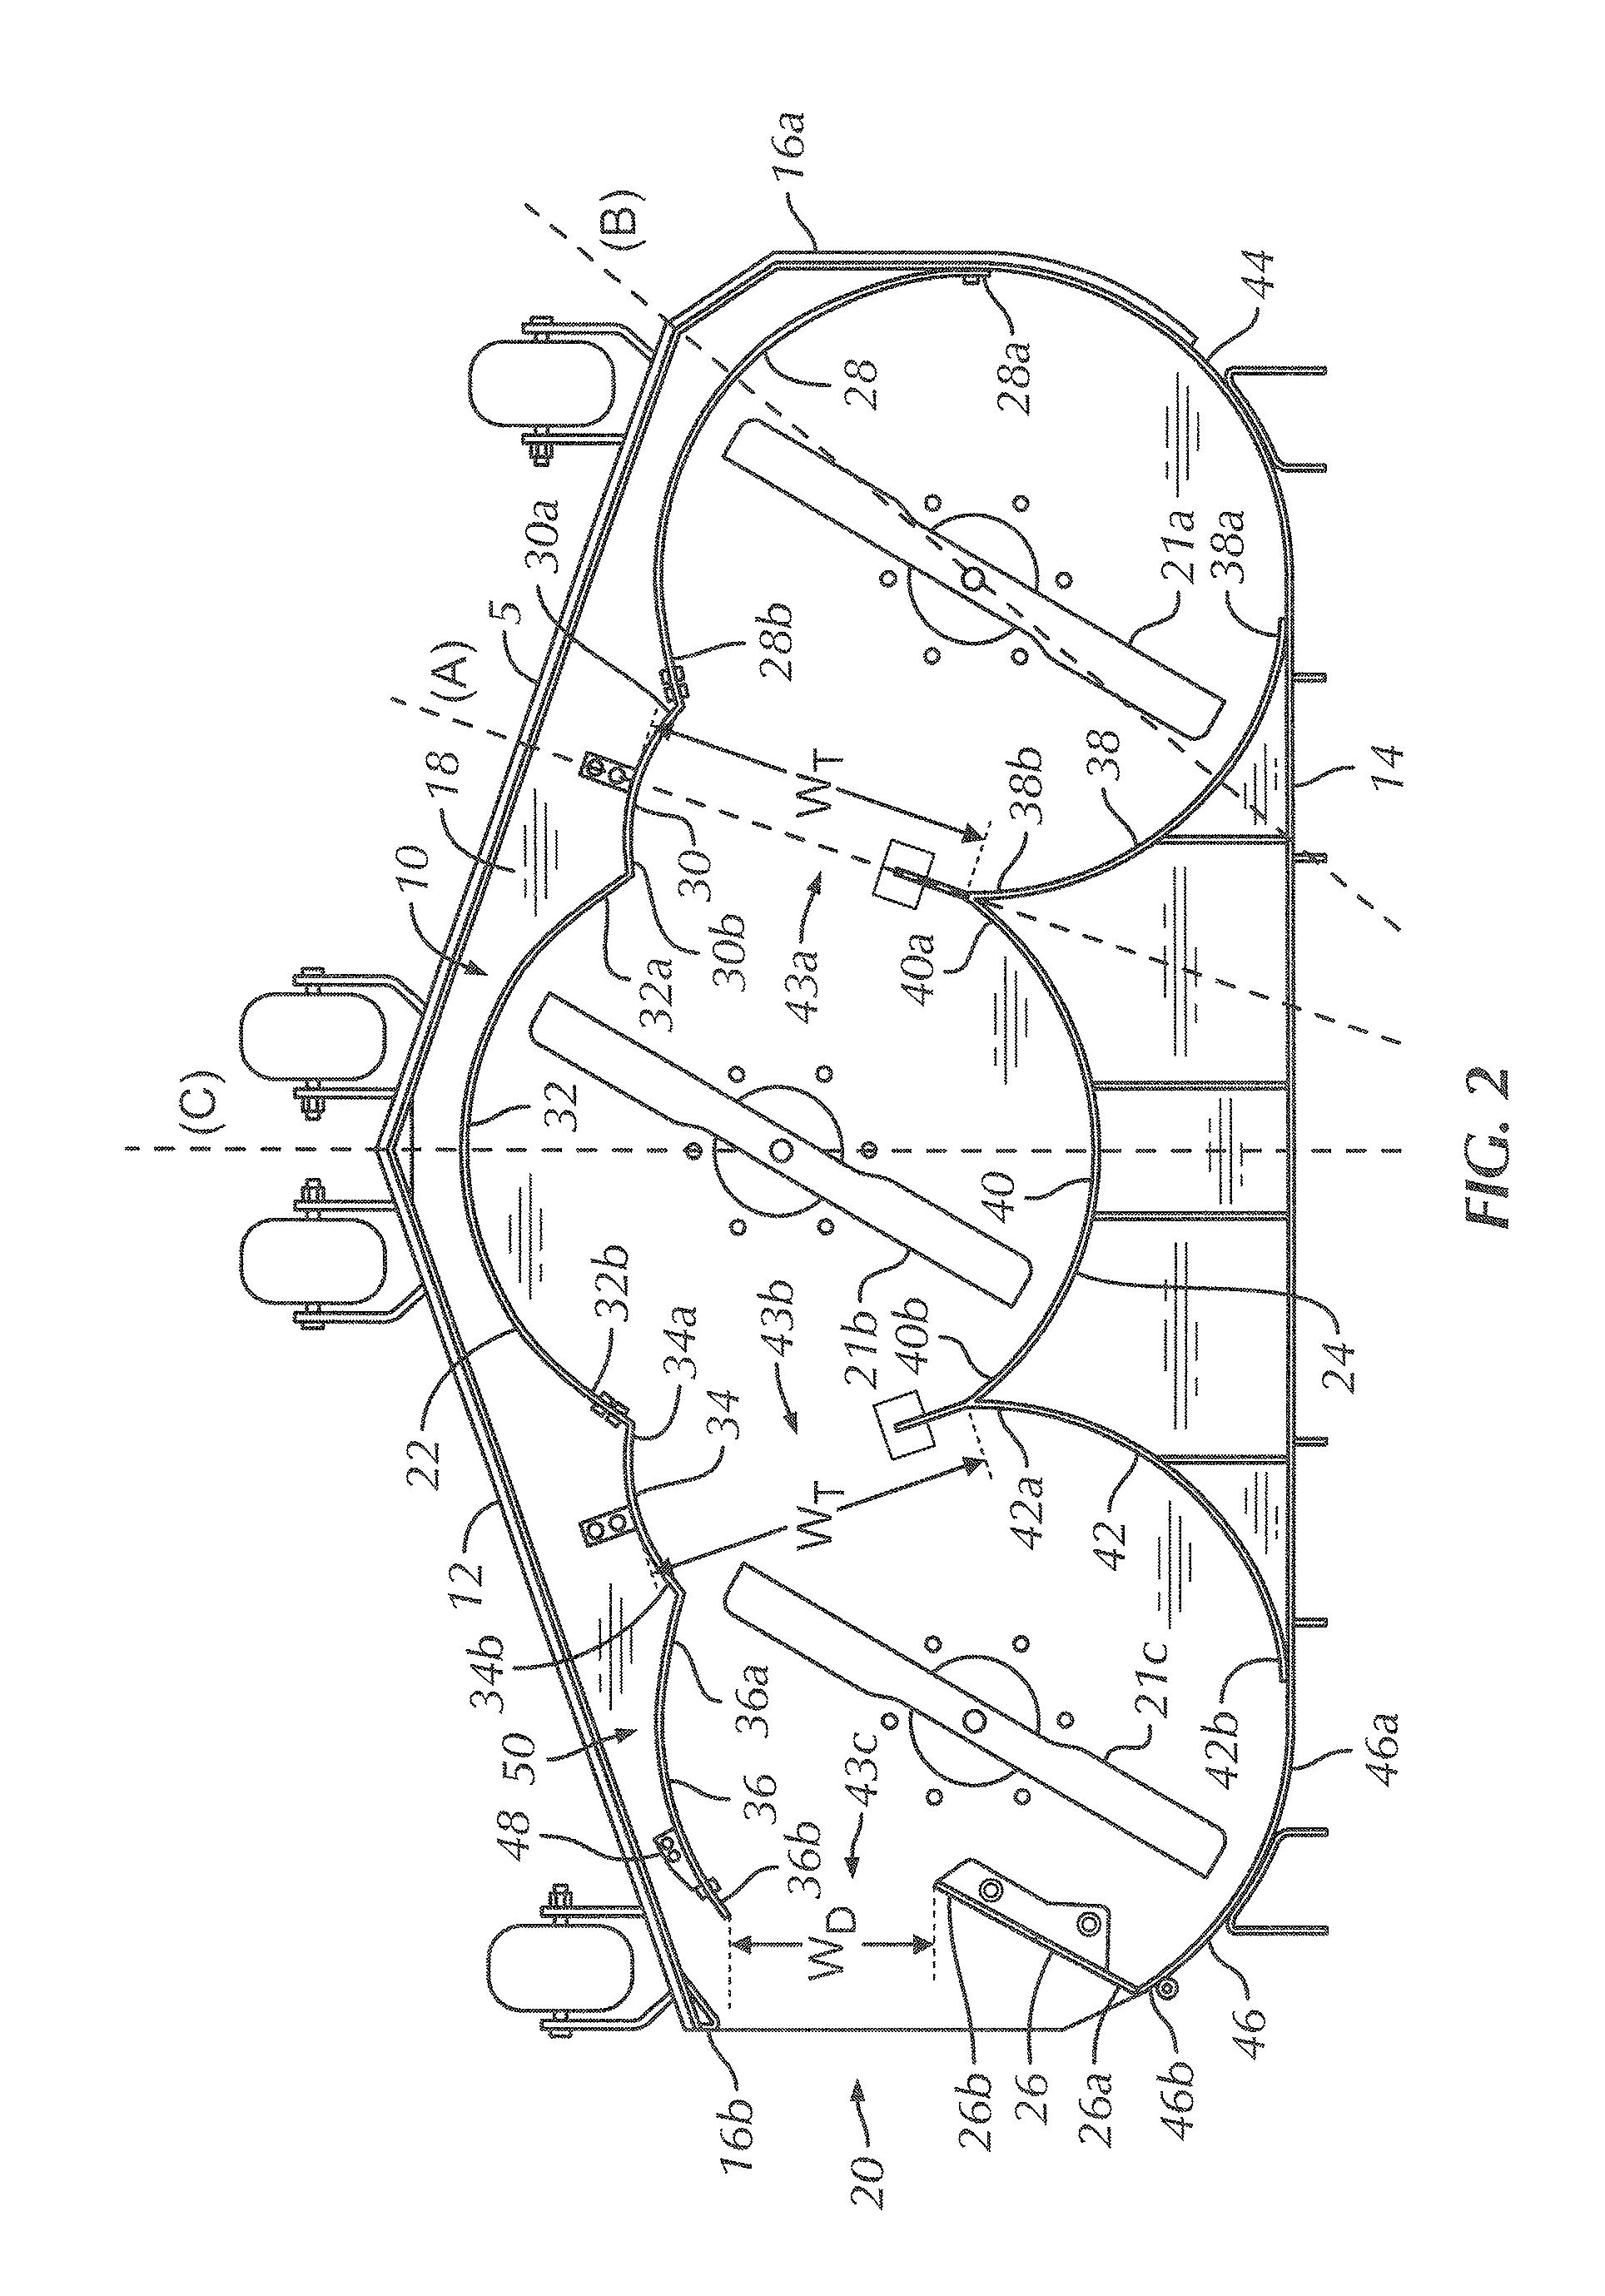 patent us8171709 - mower baffle system